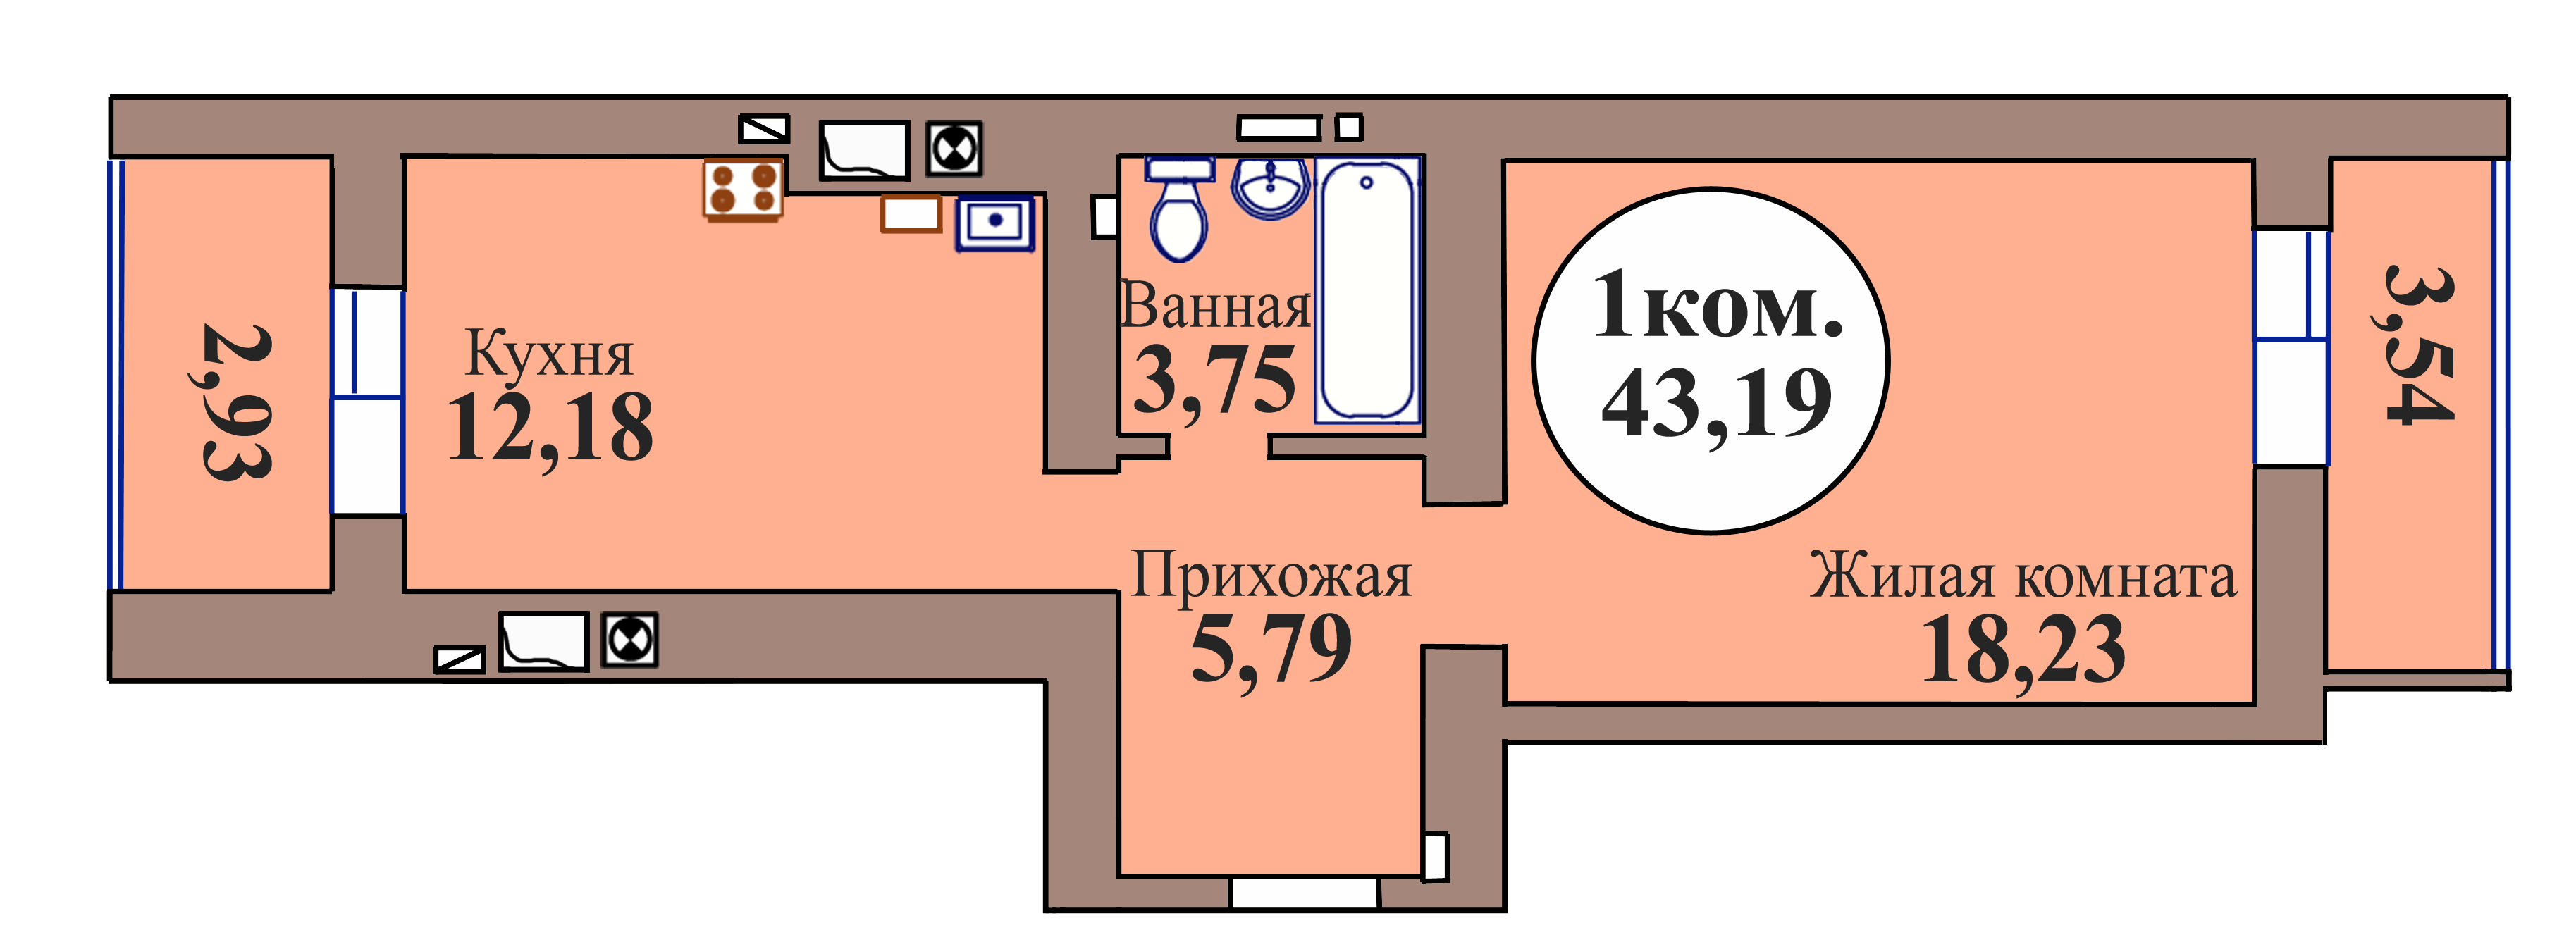 1-комн. кв. по пер. Калининградский, 5 кв. 87 в Калининграде